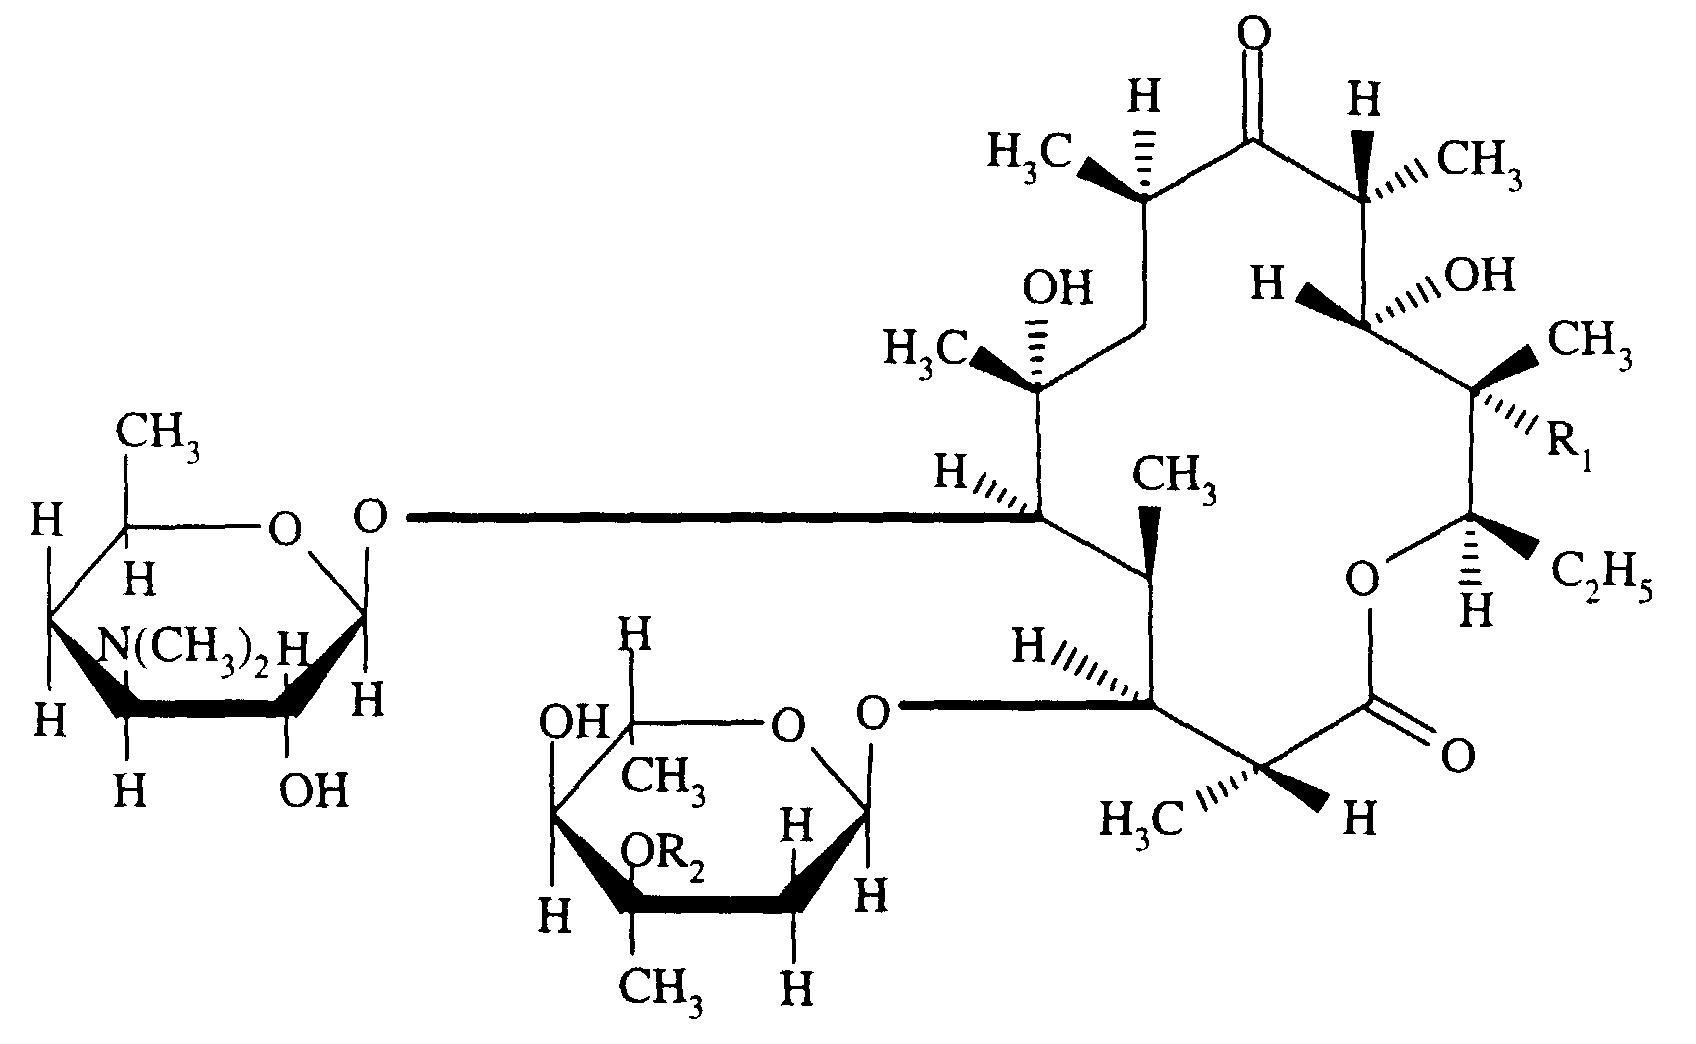 seroflo metered dose inhaler